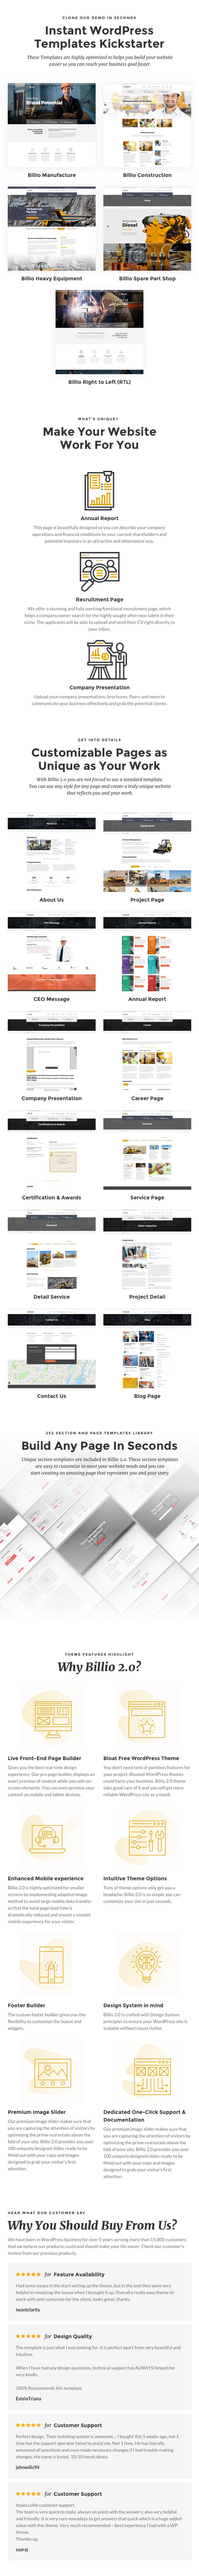 Billio 2.0 - موضوع WordPress للهندسة والصناعية - 1